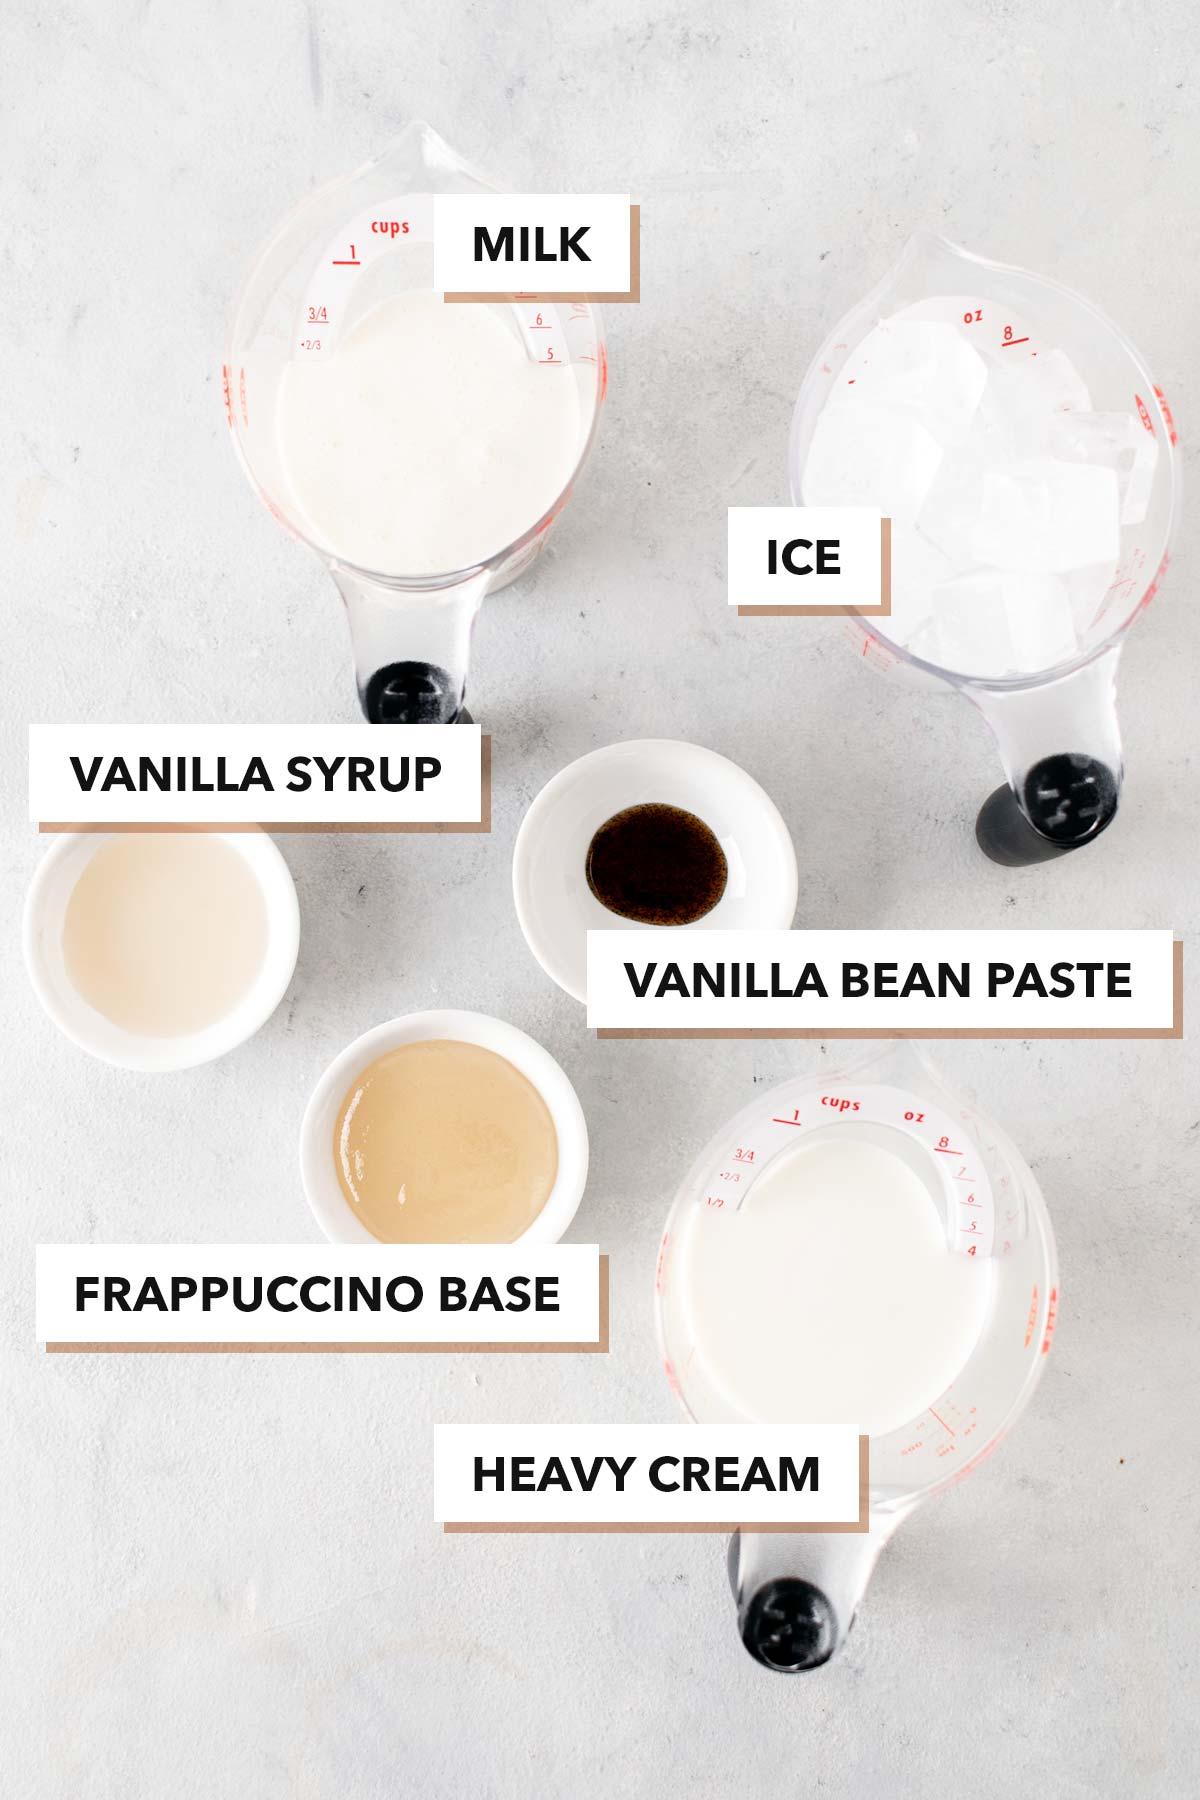 Vanilla Bean Frappuccino ingredients.